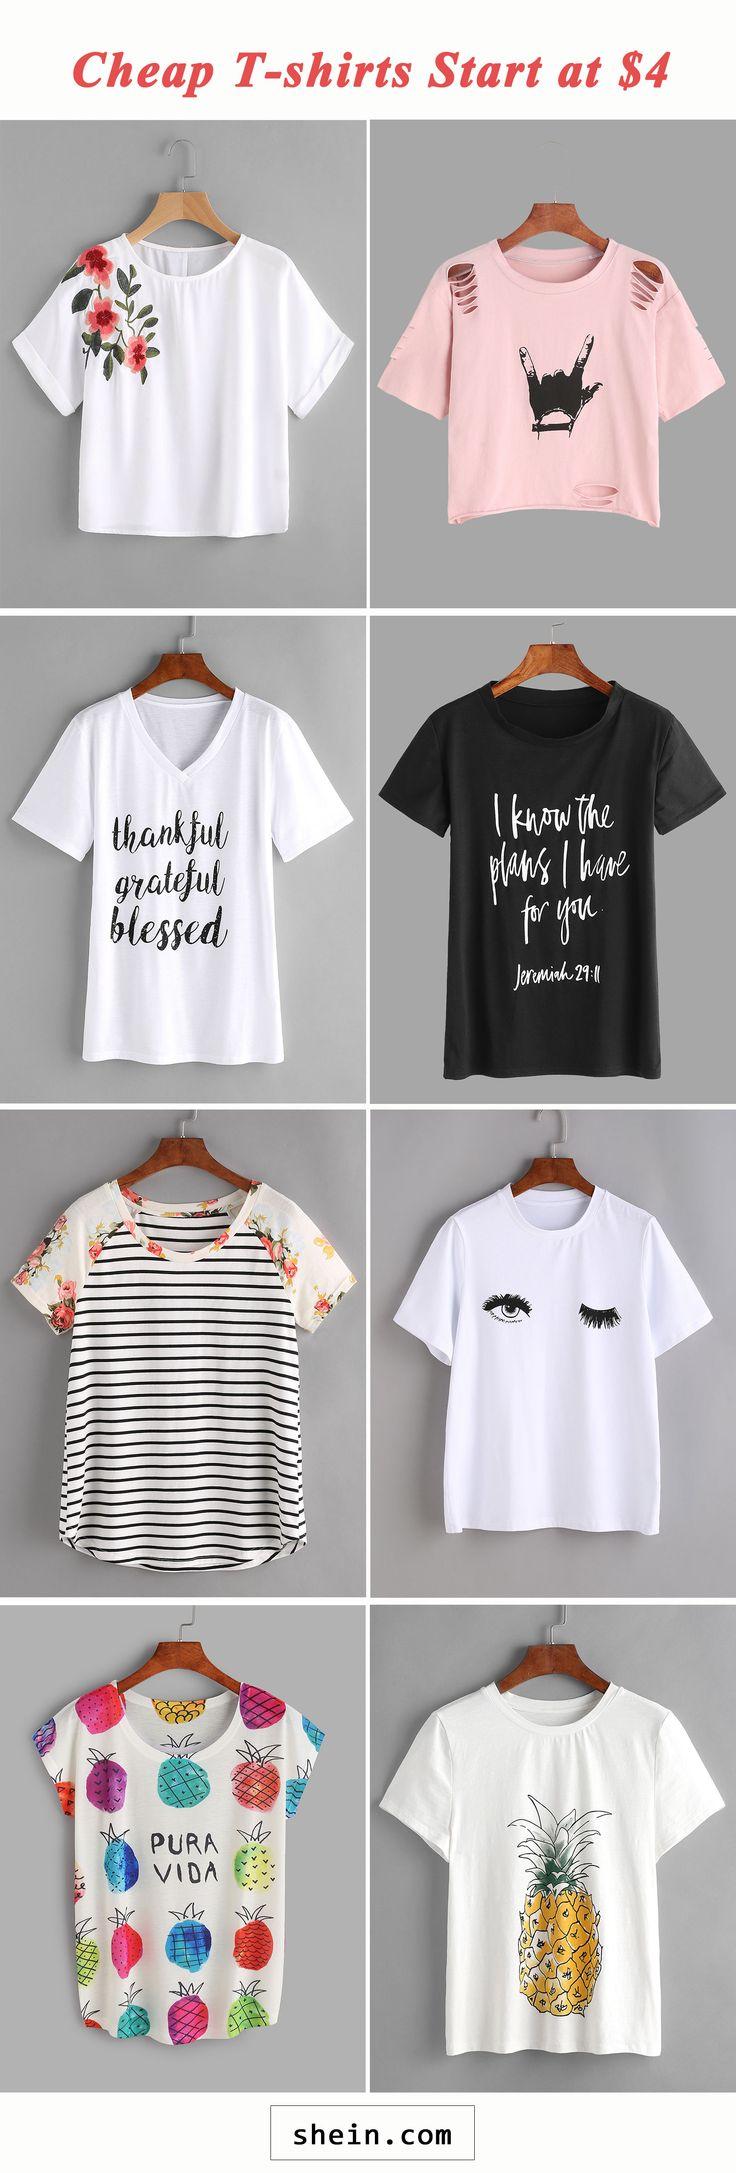 Cheap T-shirts start at $4!